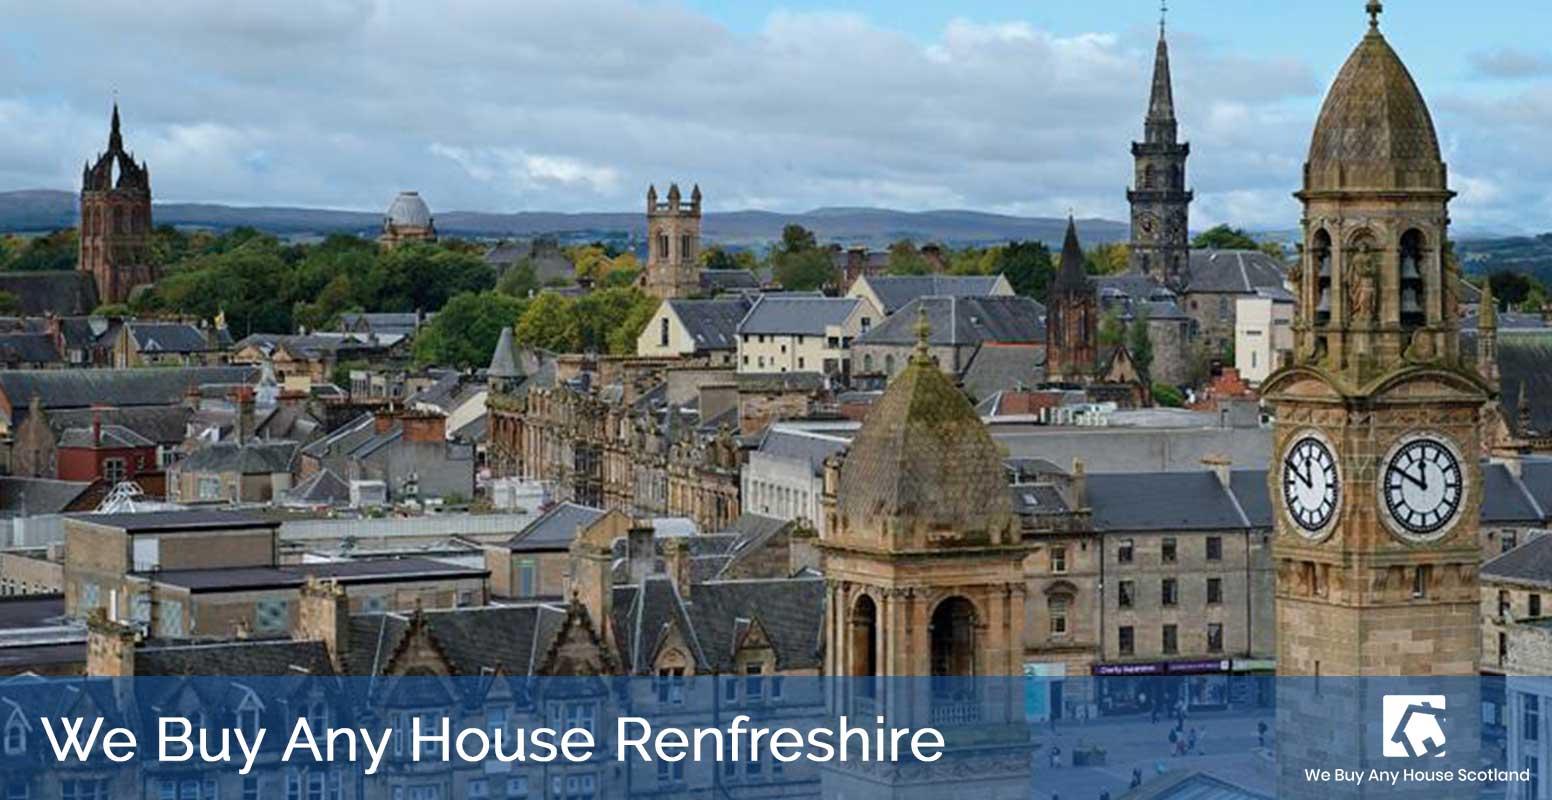 We Buy Any House Renfrewshire